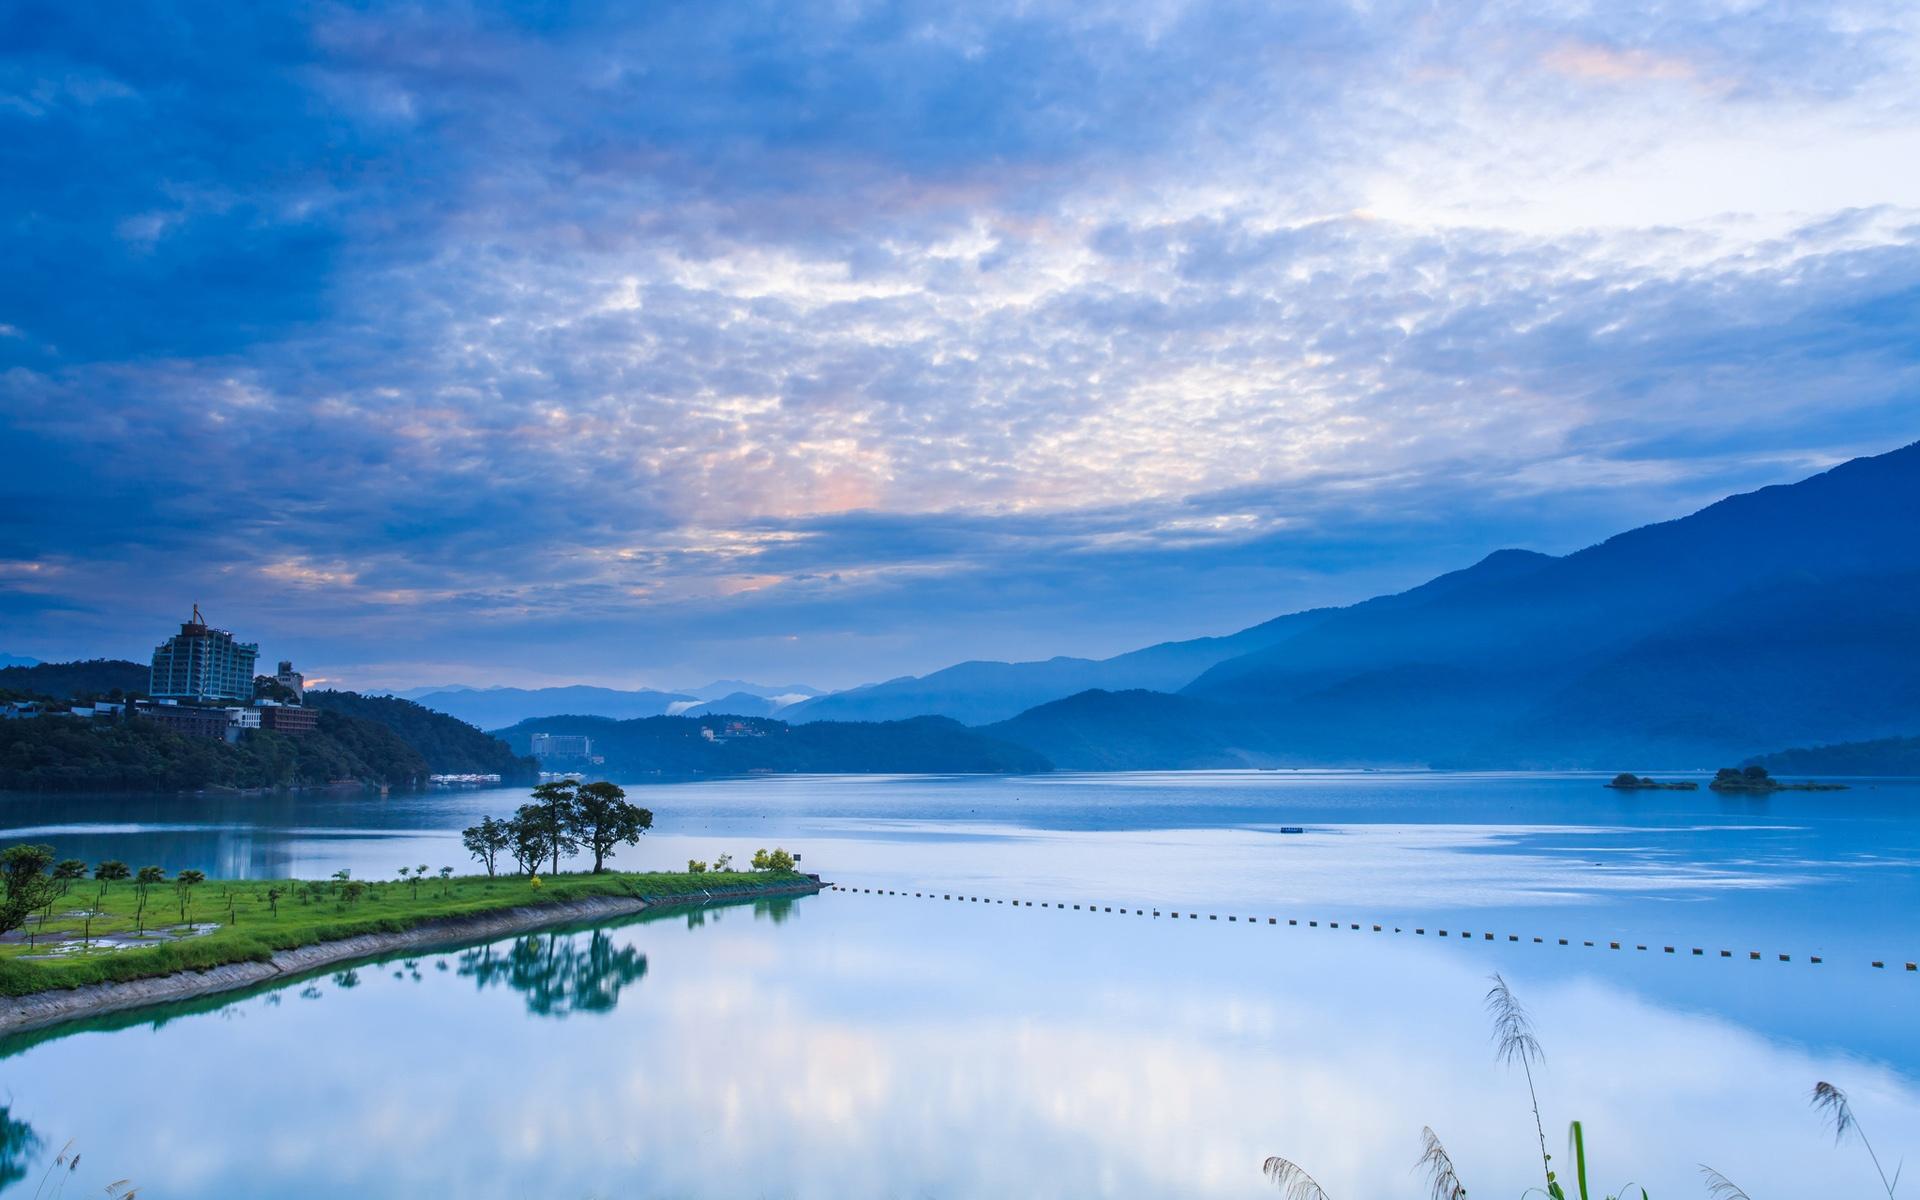 mountains sky lake reflection - photo #24